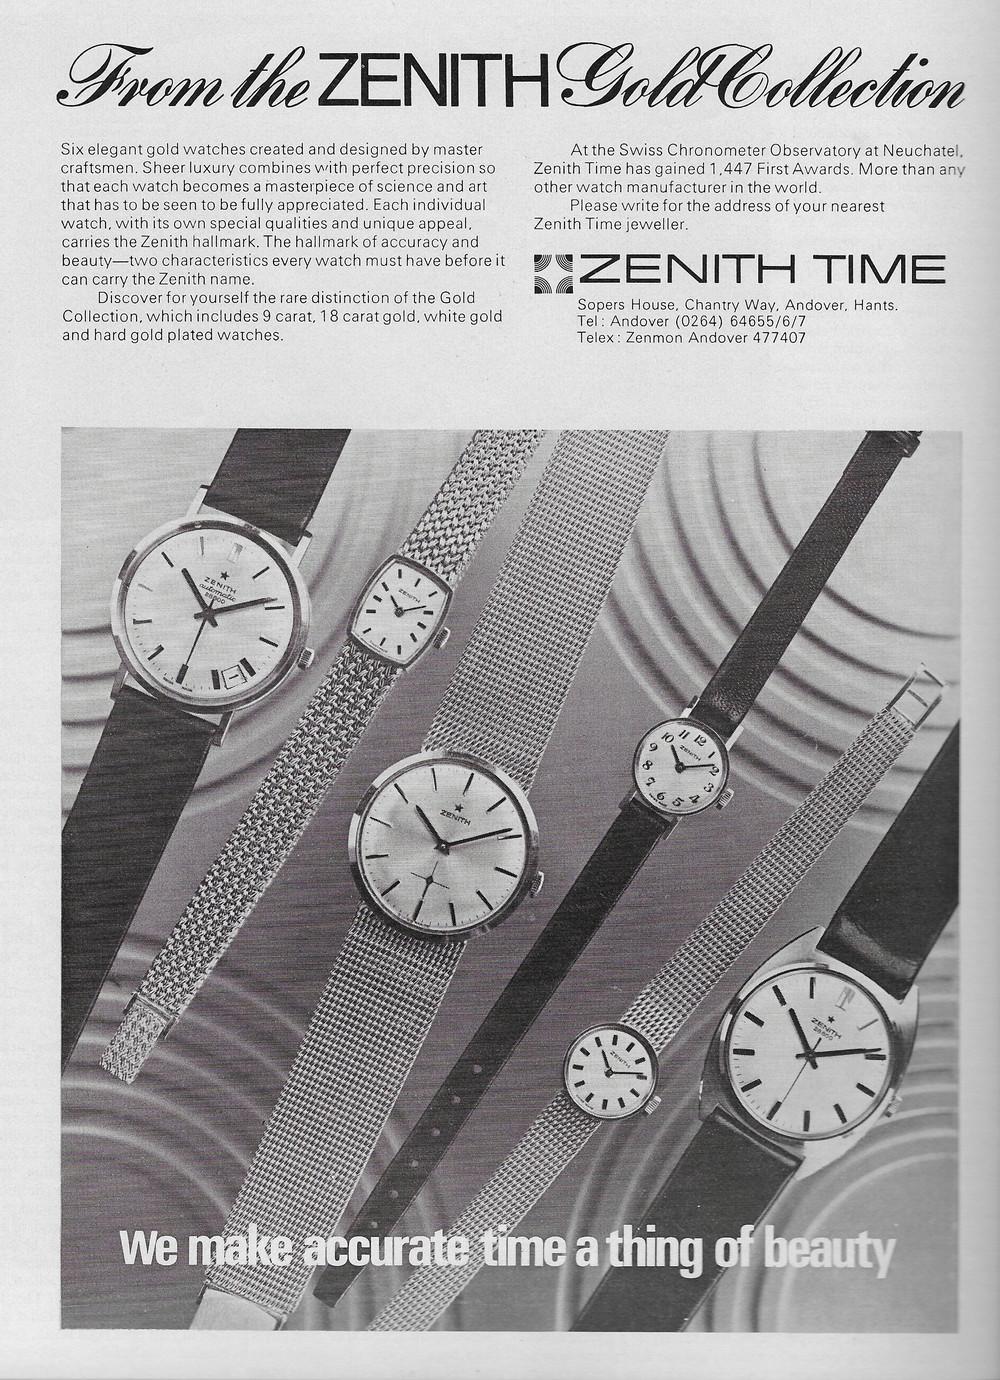 Vintage Zenith Advert 1973.JPG